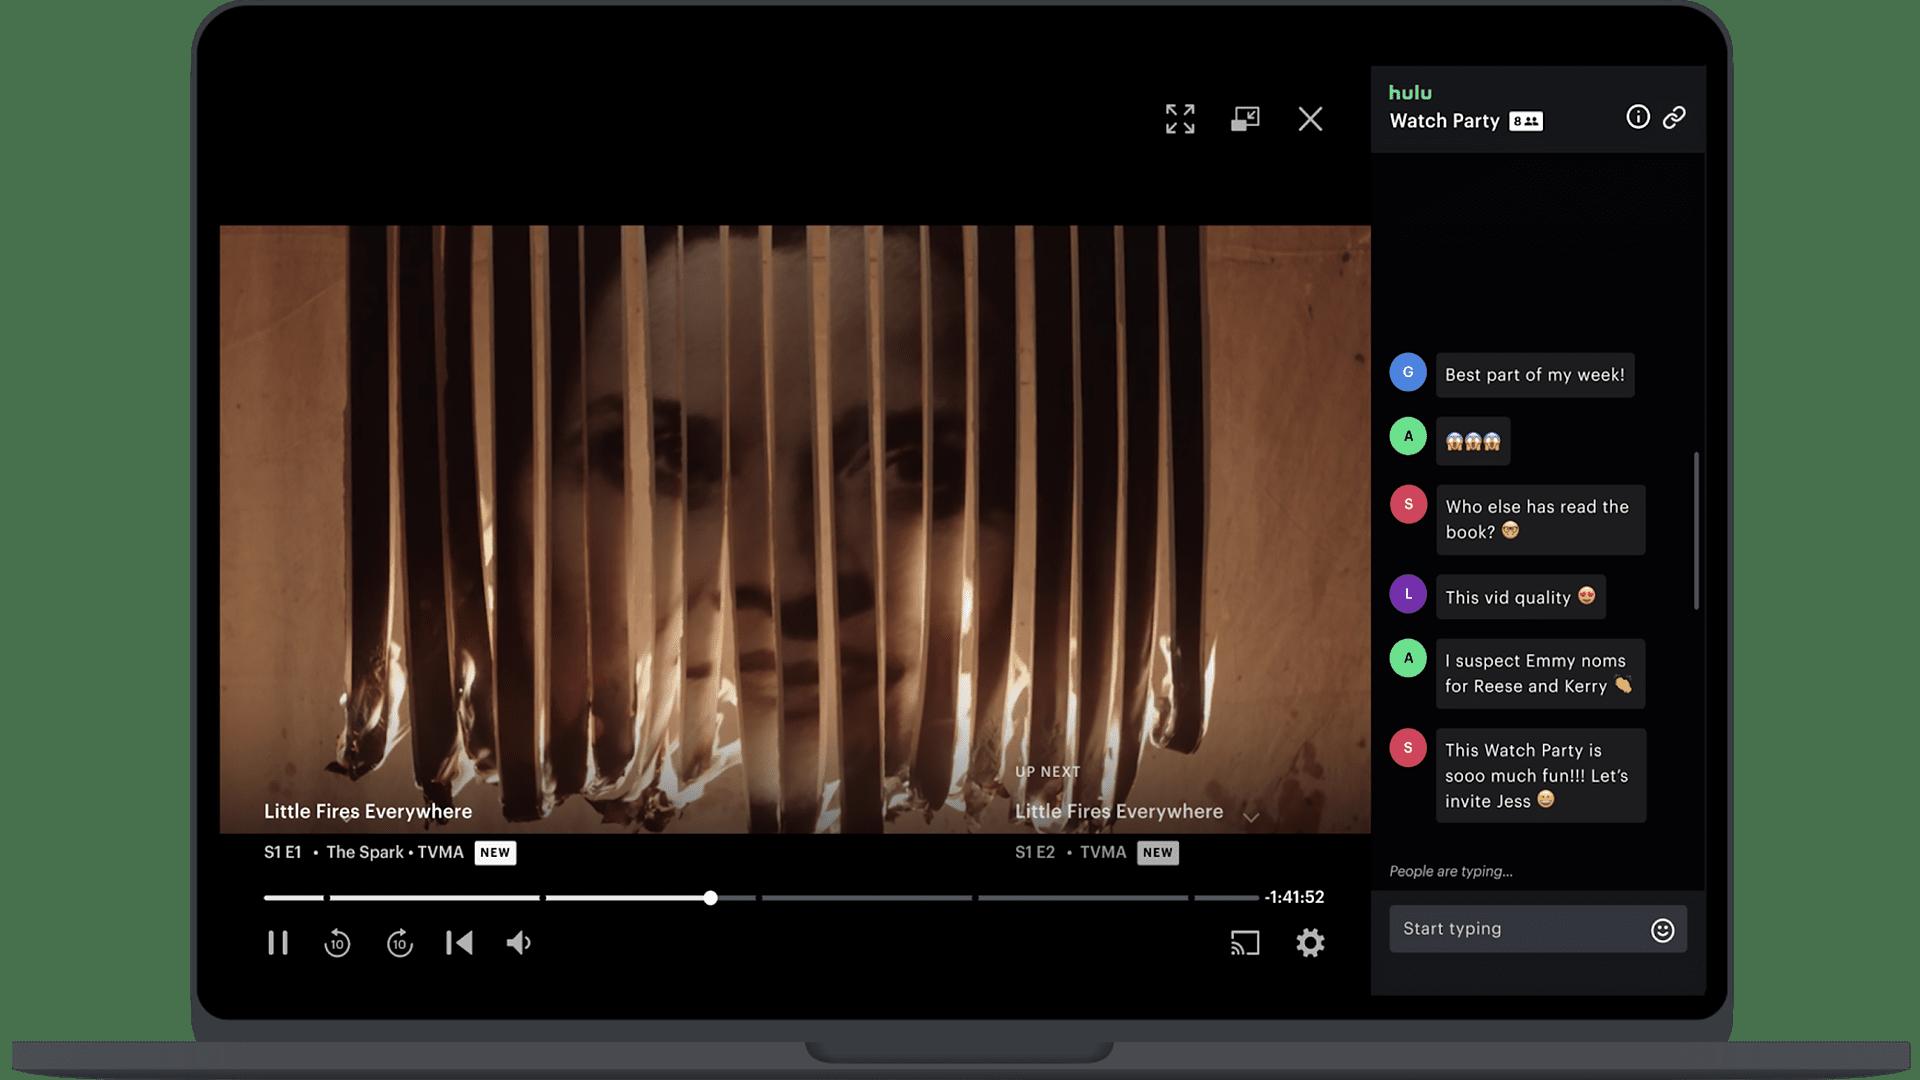 A Hulu watch party on a laptop.